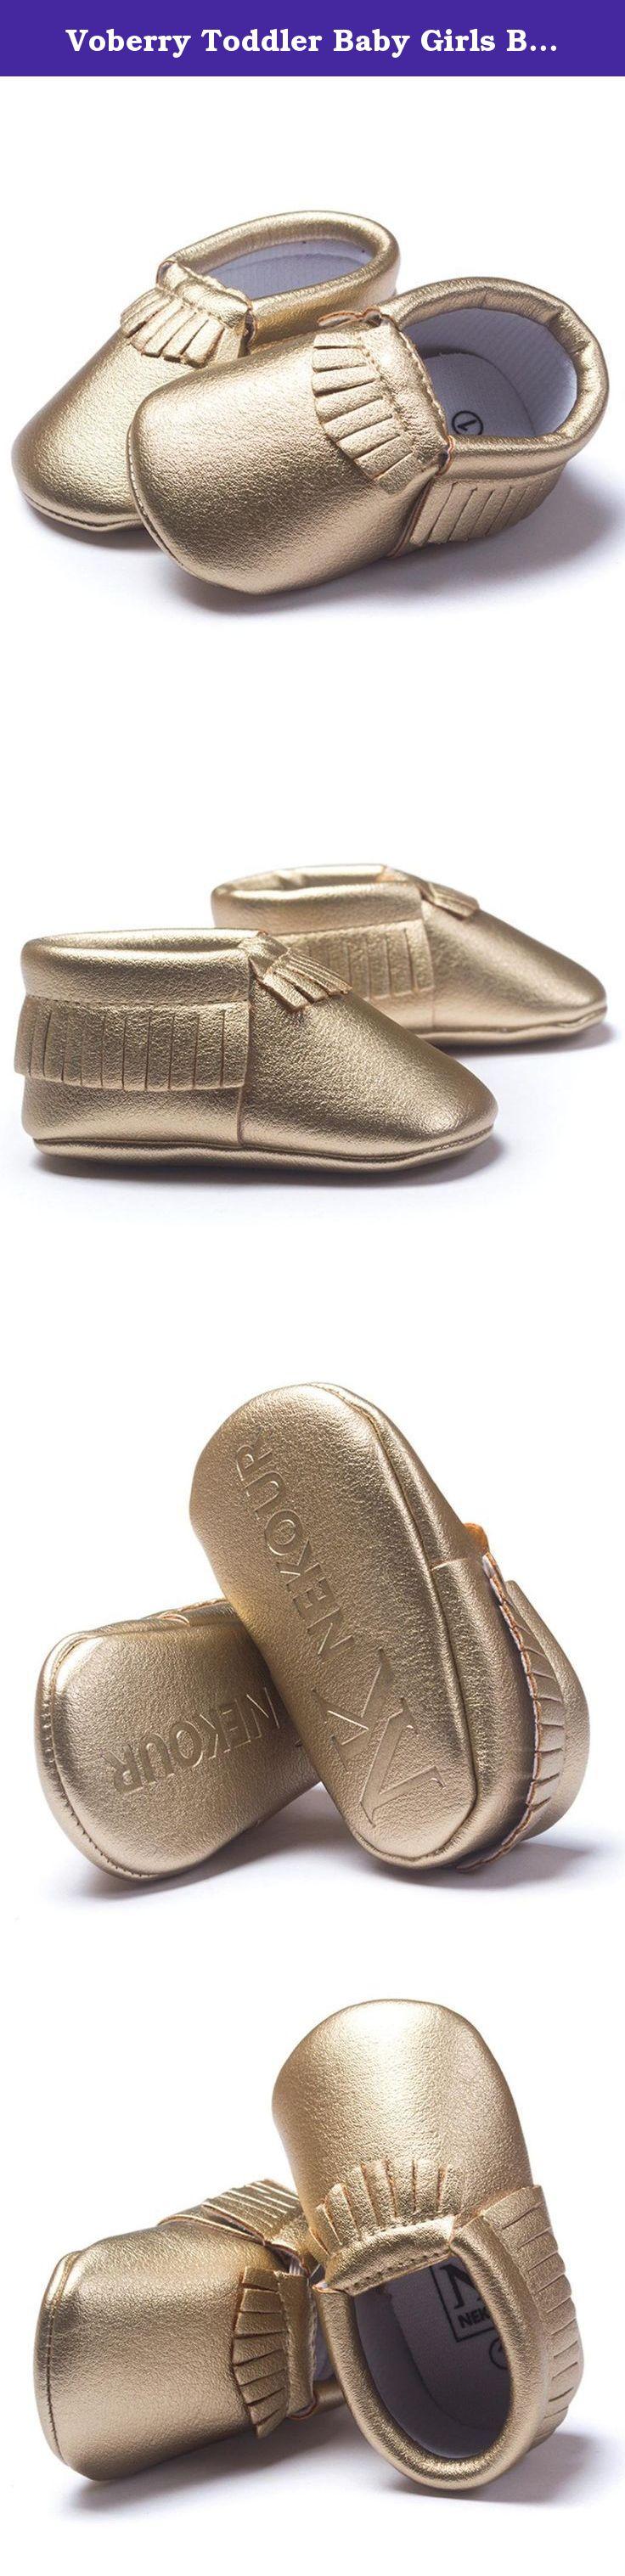 Voberry Toddler Baby Girls Boy s Sneaker Tassels Moccasins Anti slip